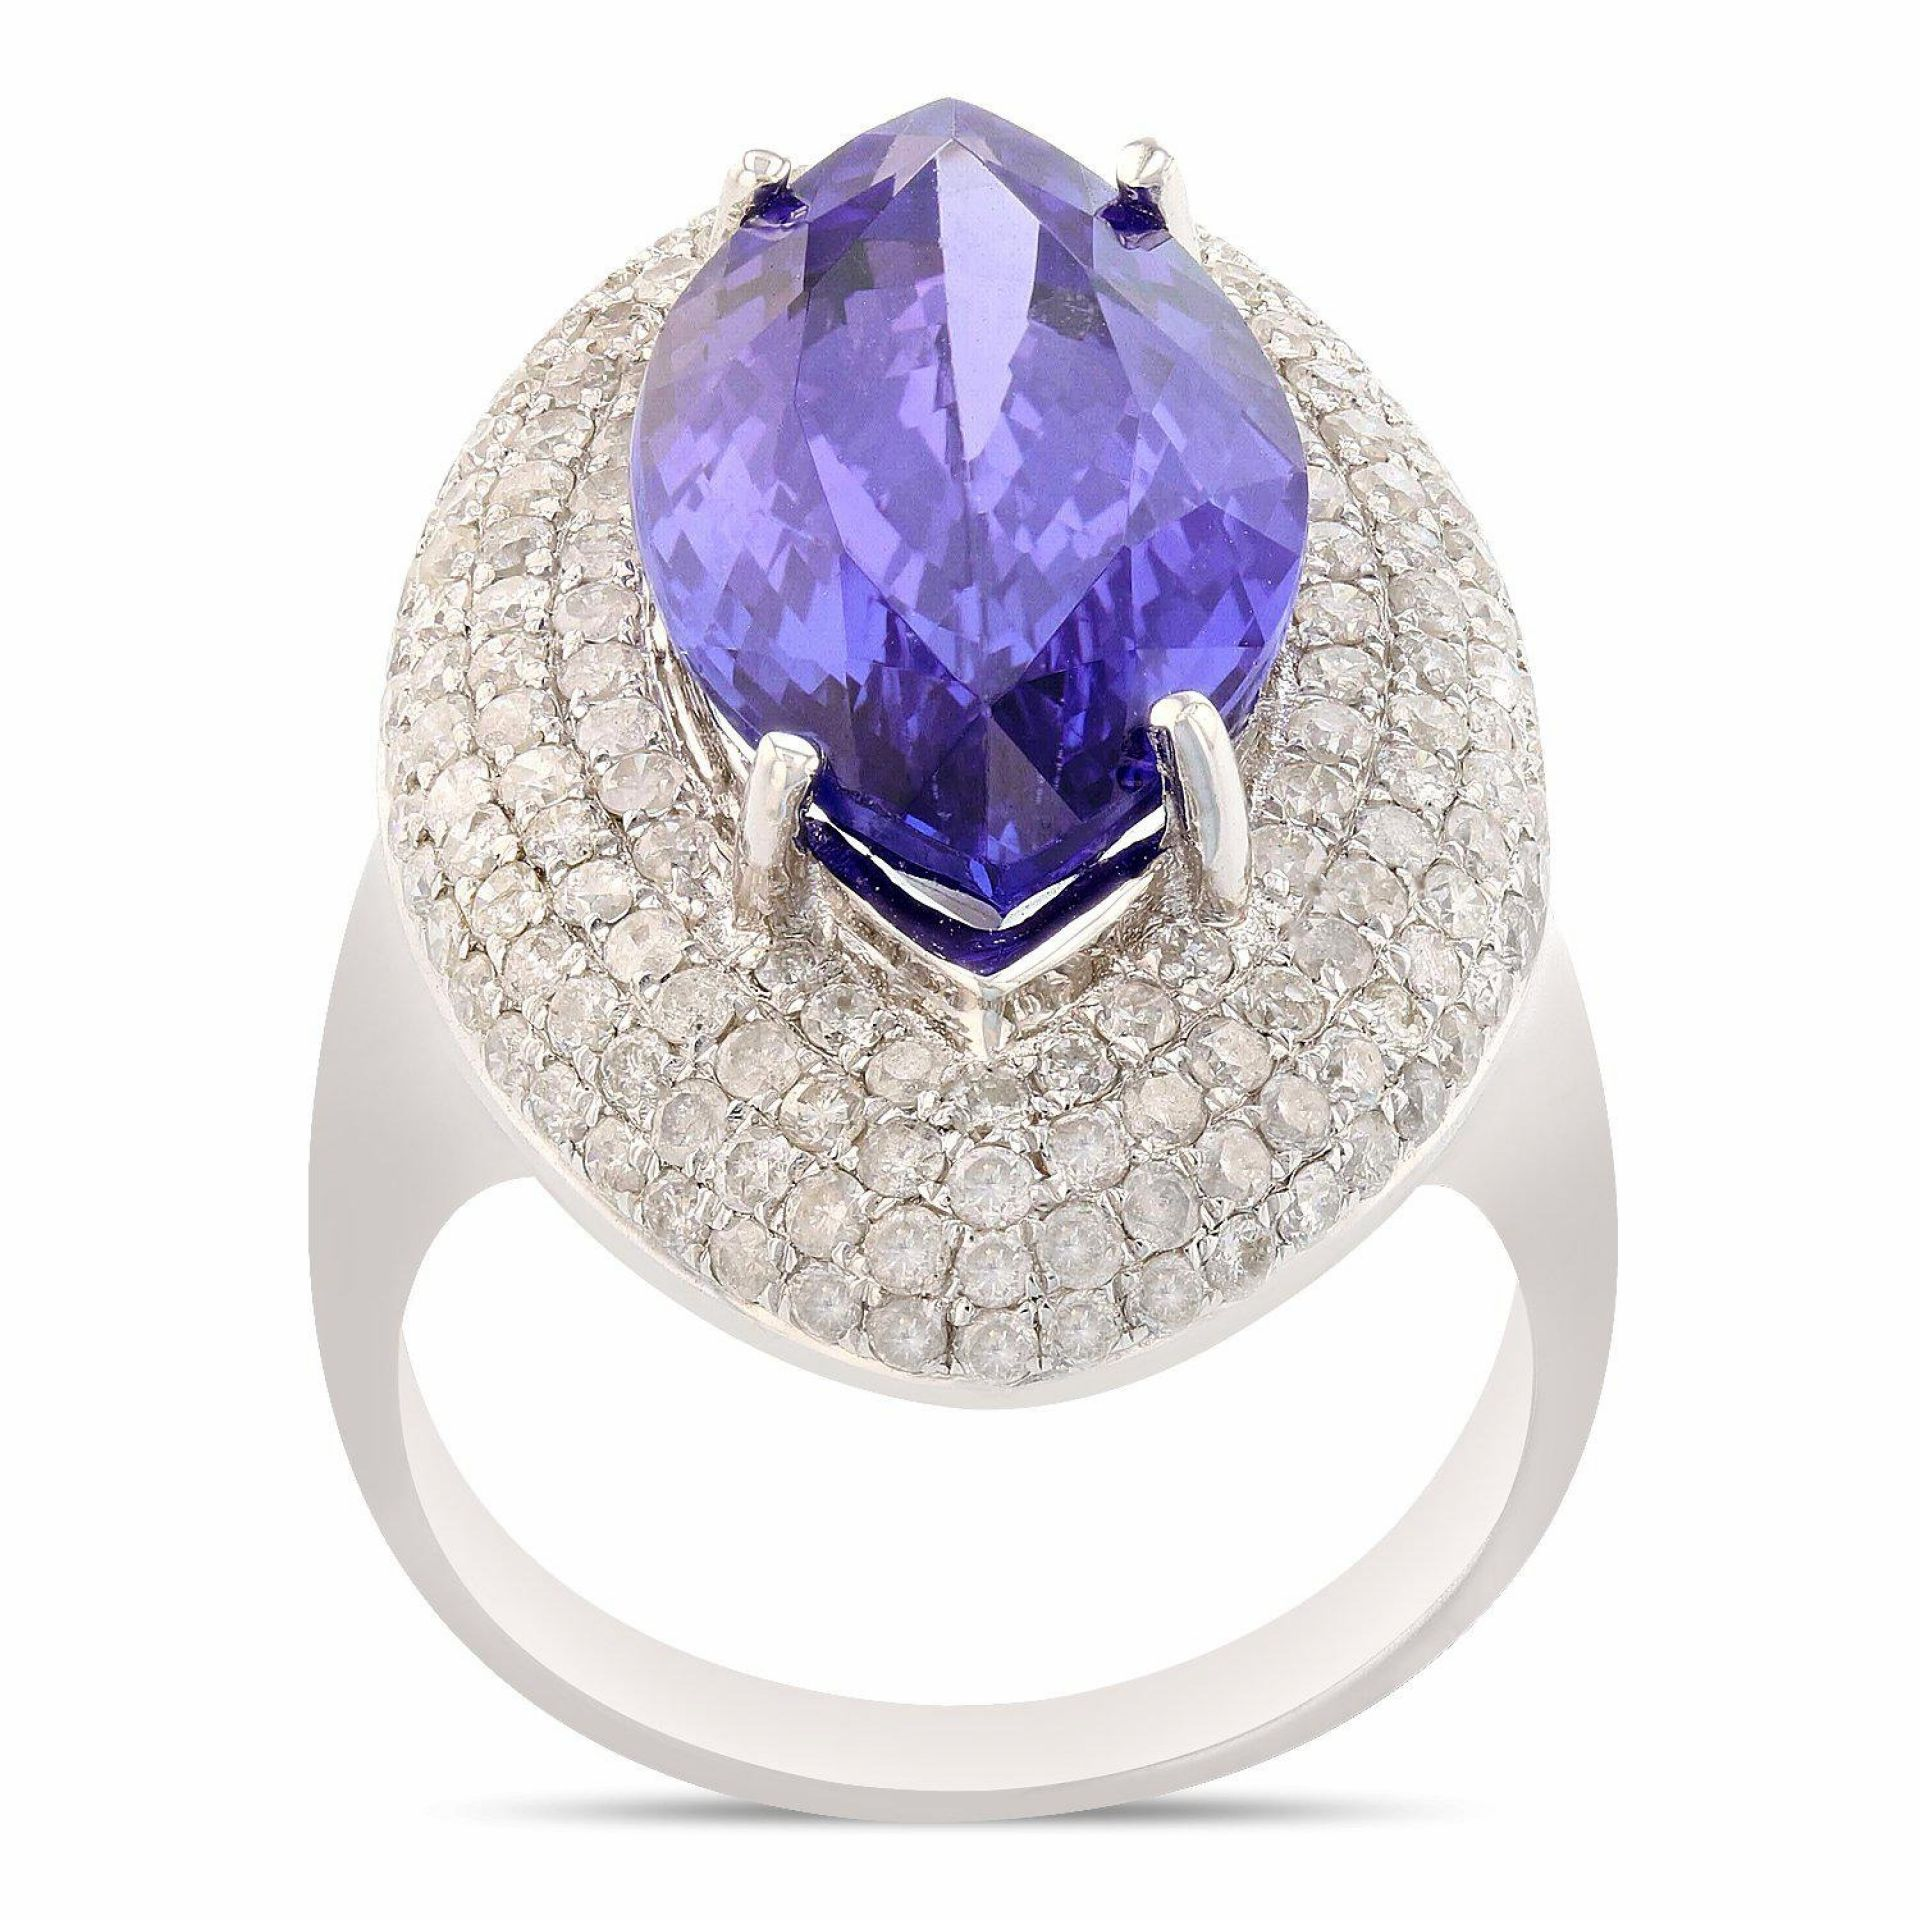 7.67ct Tanzanite and 1.59ctw Diamond 14K White Gold Ring (GIA CERTIFIED)